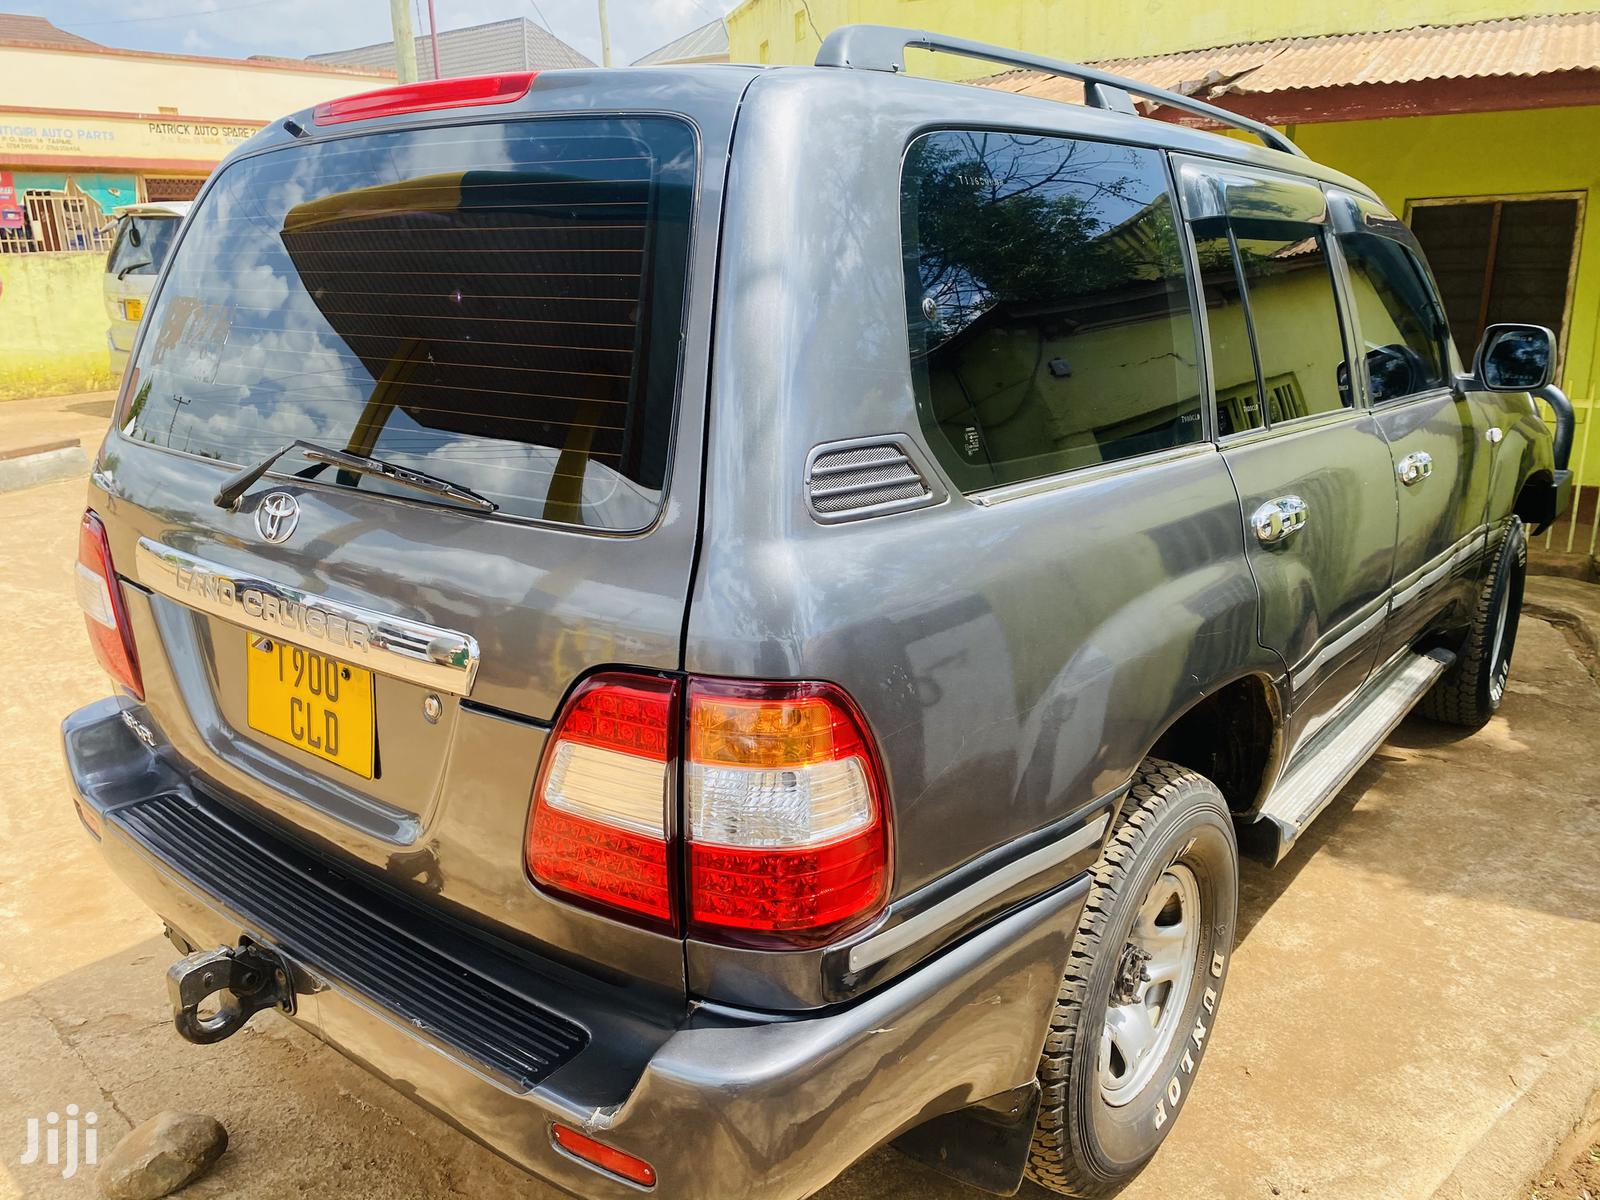 Toyota Land Cruiser 2004 Black | Cars for sale in Ilemela, Mwanza Region, Tanzania